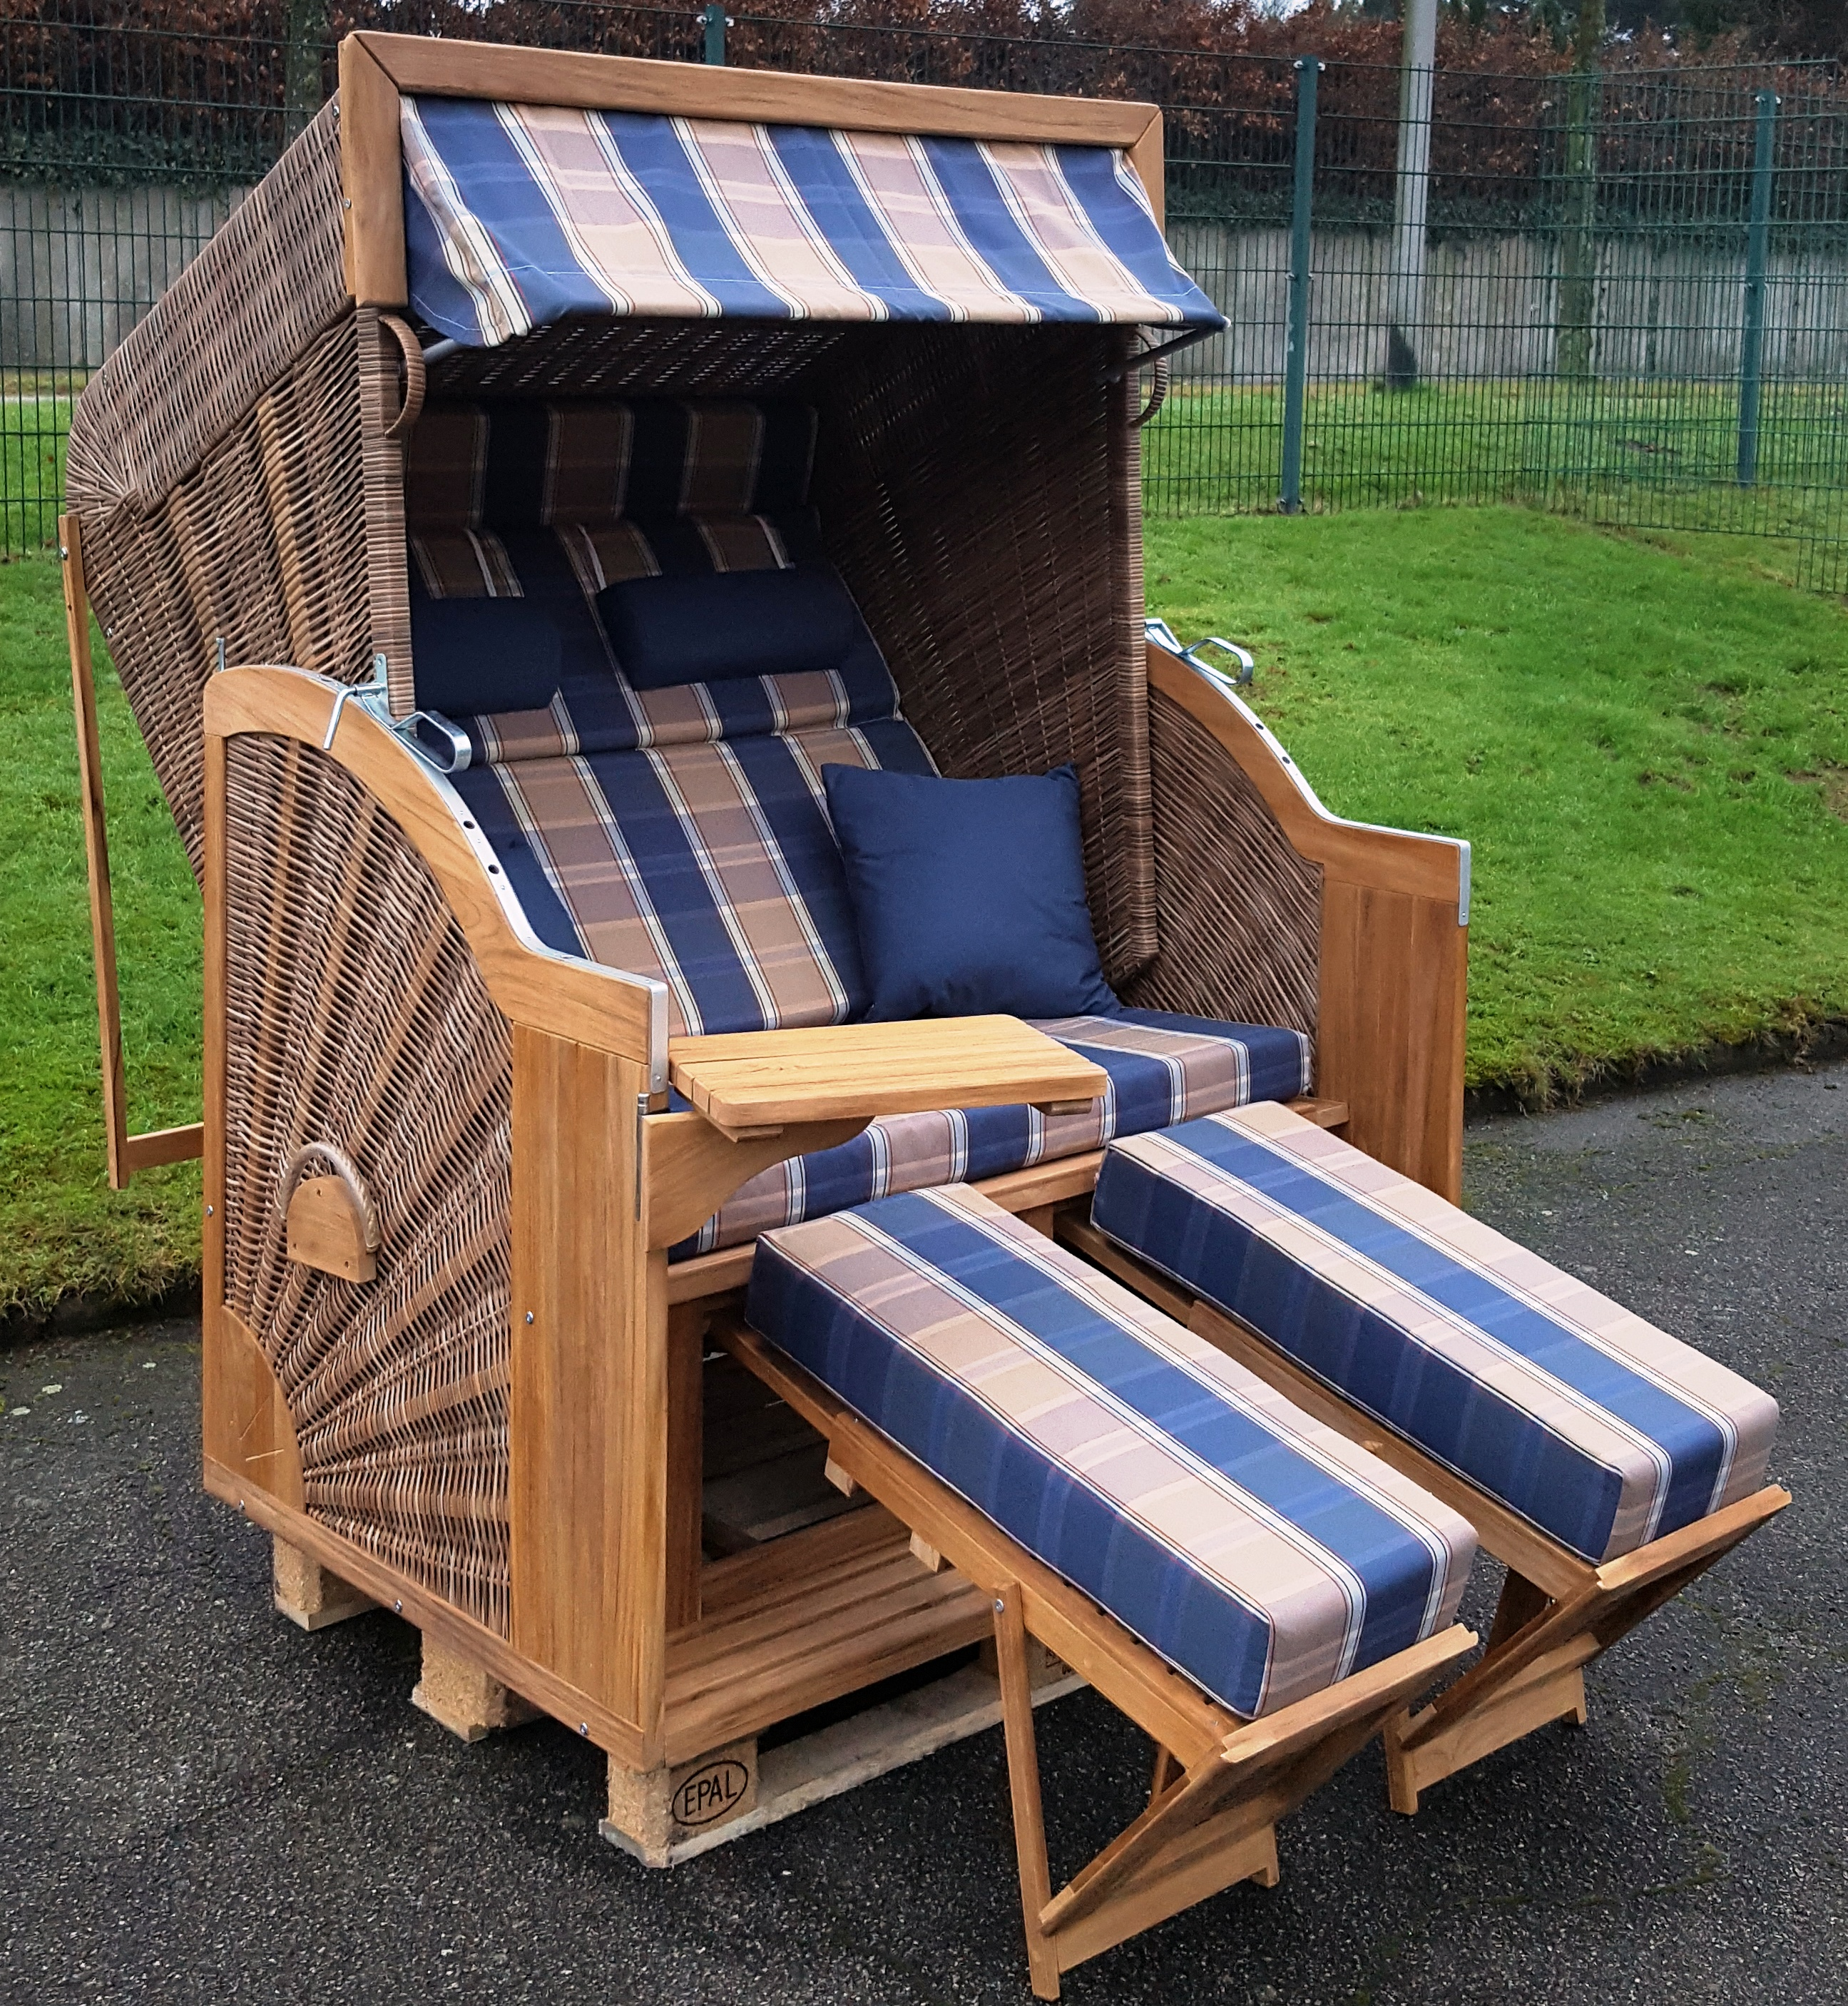 devries comfort strandkorb pure xl teak pe griseum stoff 428 zubeh r montiert ebay. Black Bedroom Furniture Sets. Home Design Ideas